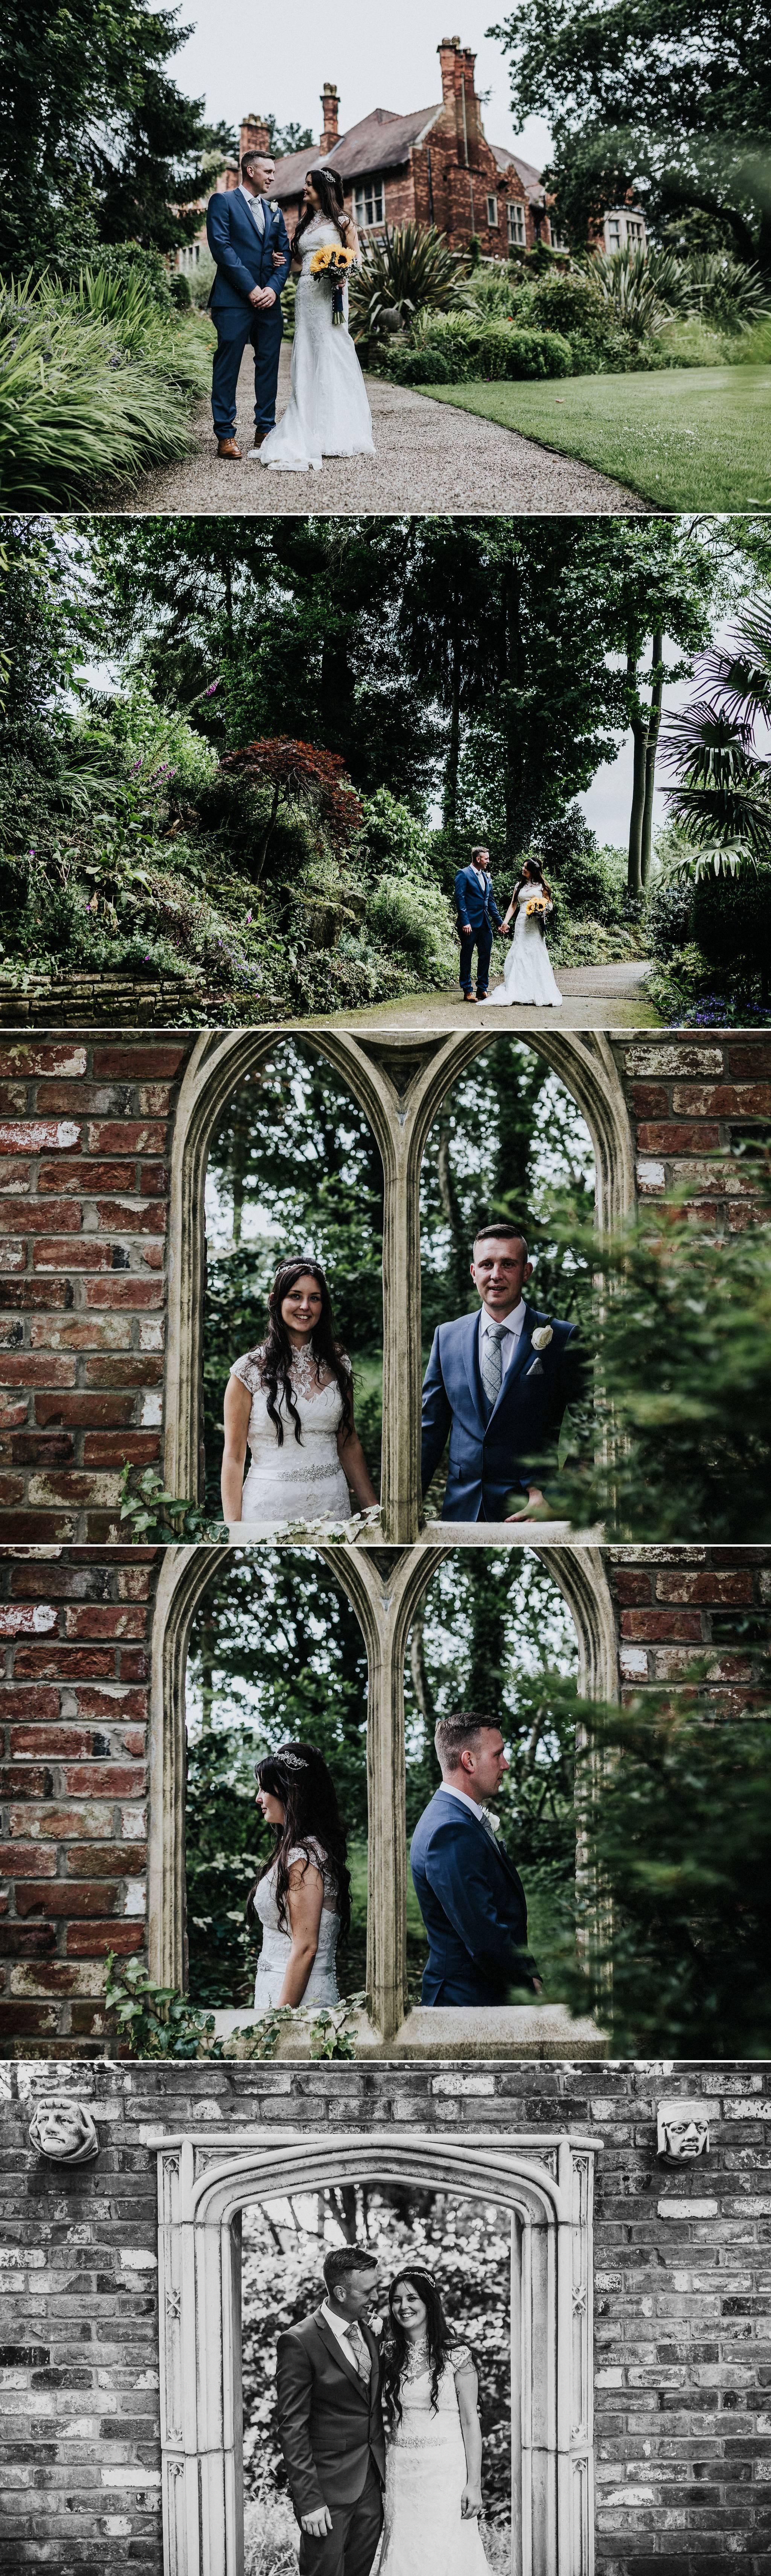 moxhull-hall-wedding-photography 14.jpg